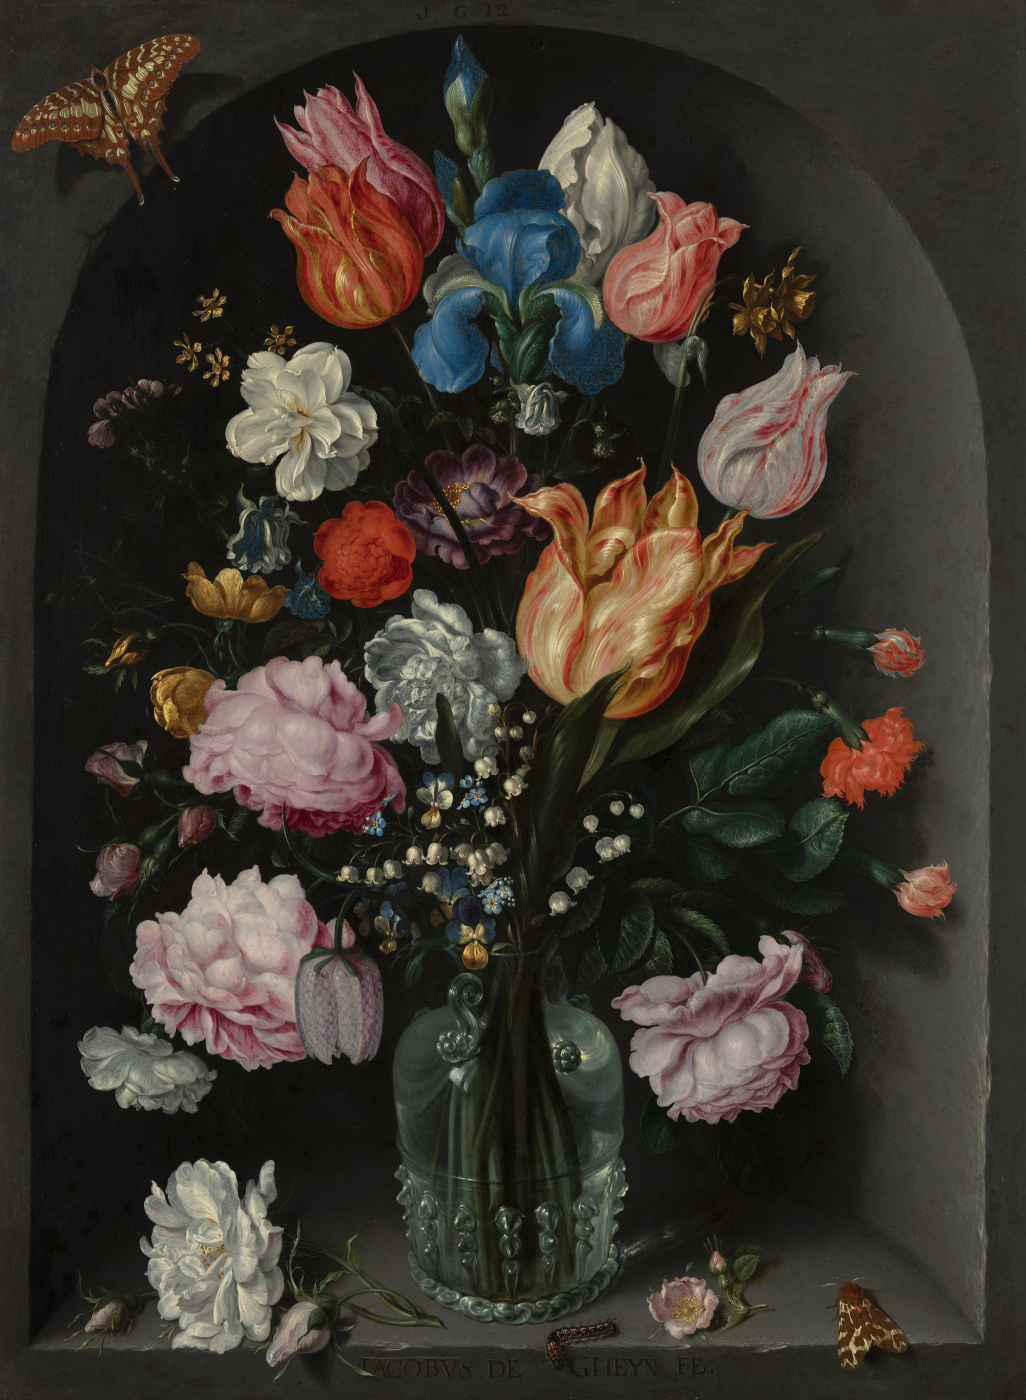 Jacob de Heine. Still life with a glass vase in a niche